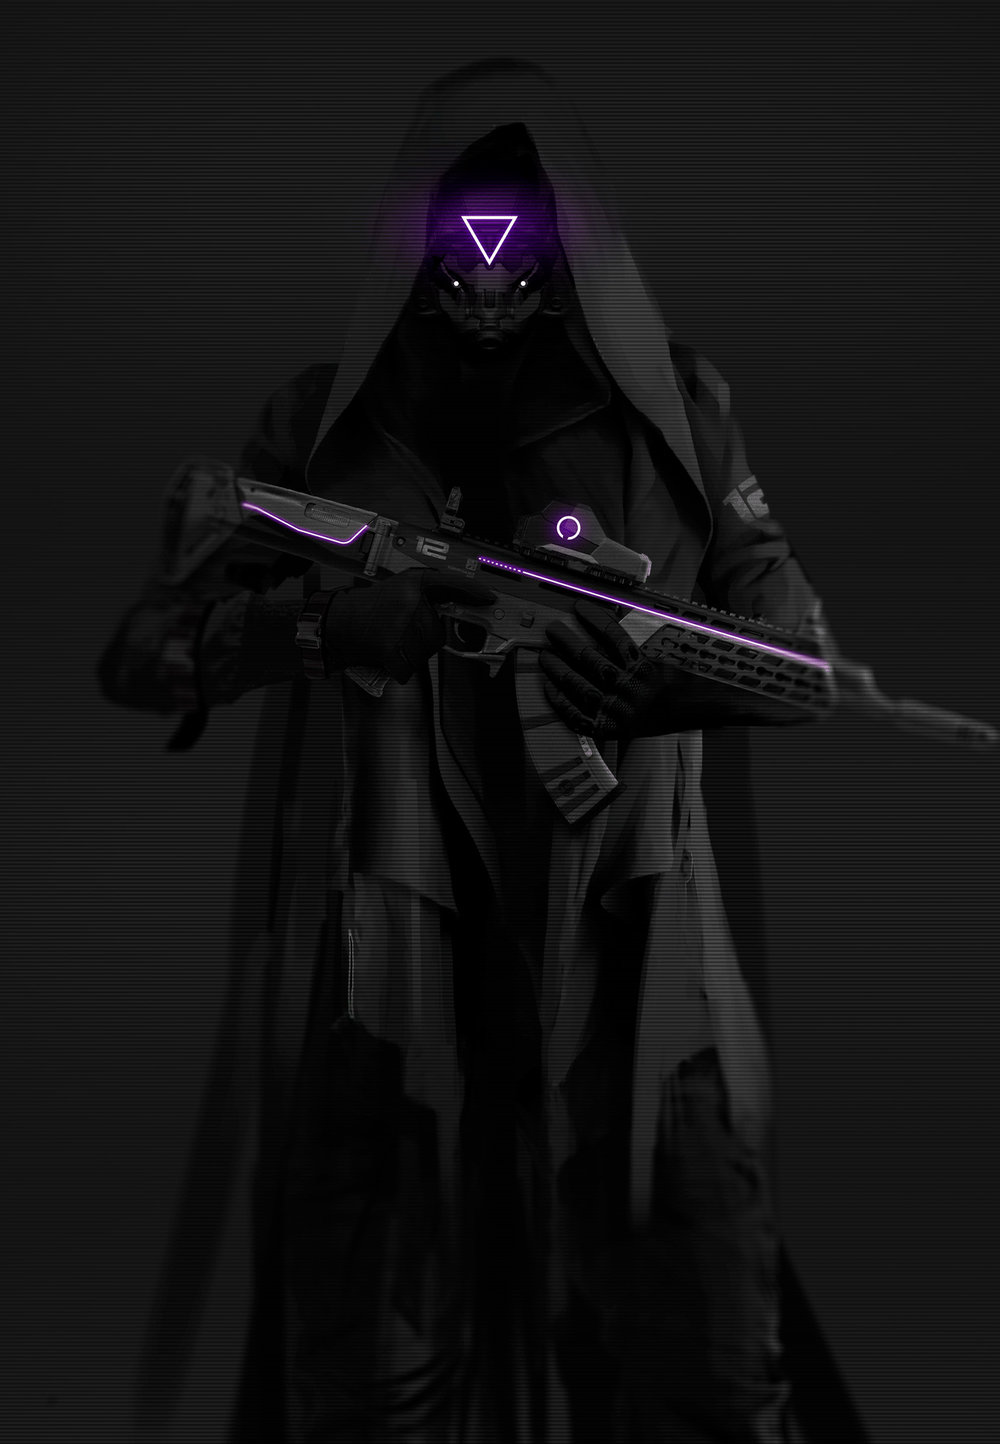 roberto-esparza-cyberpunk-soldier-final2.jpg